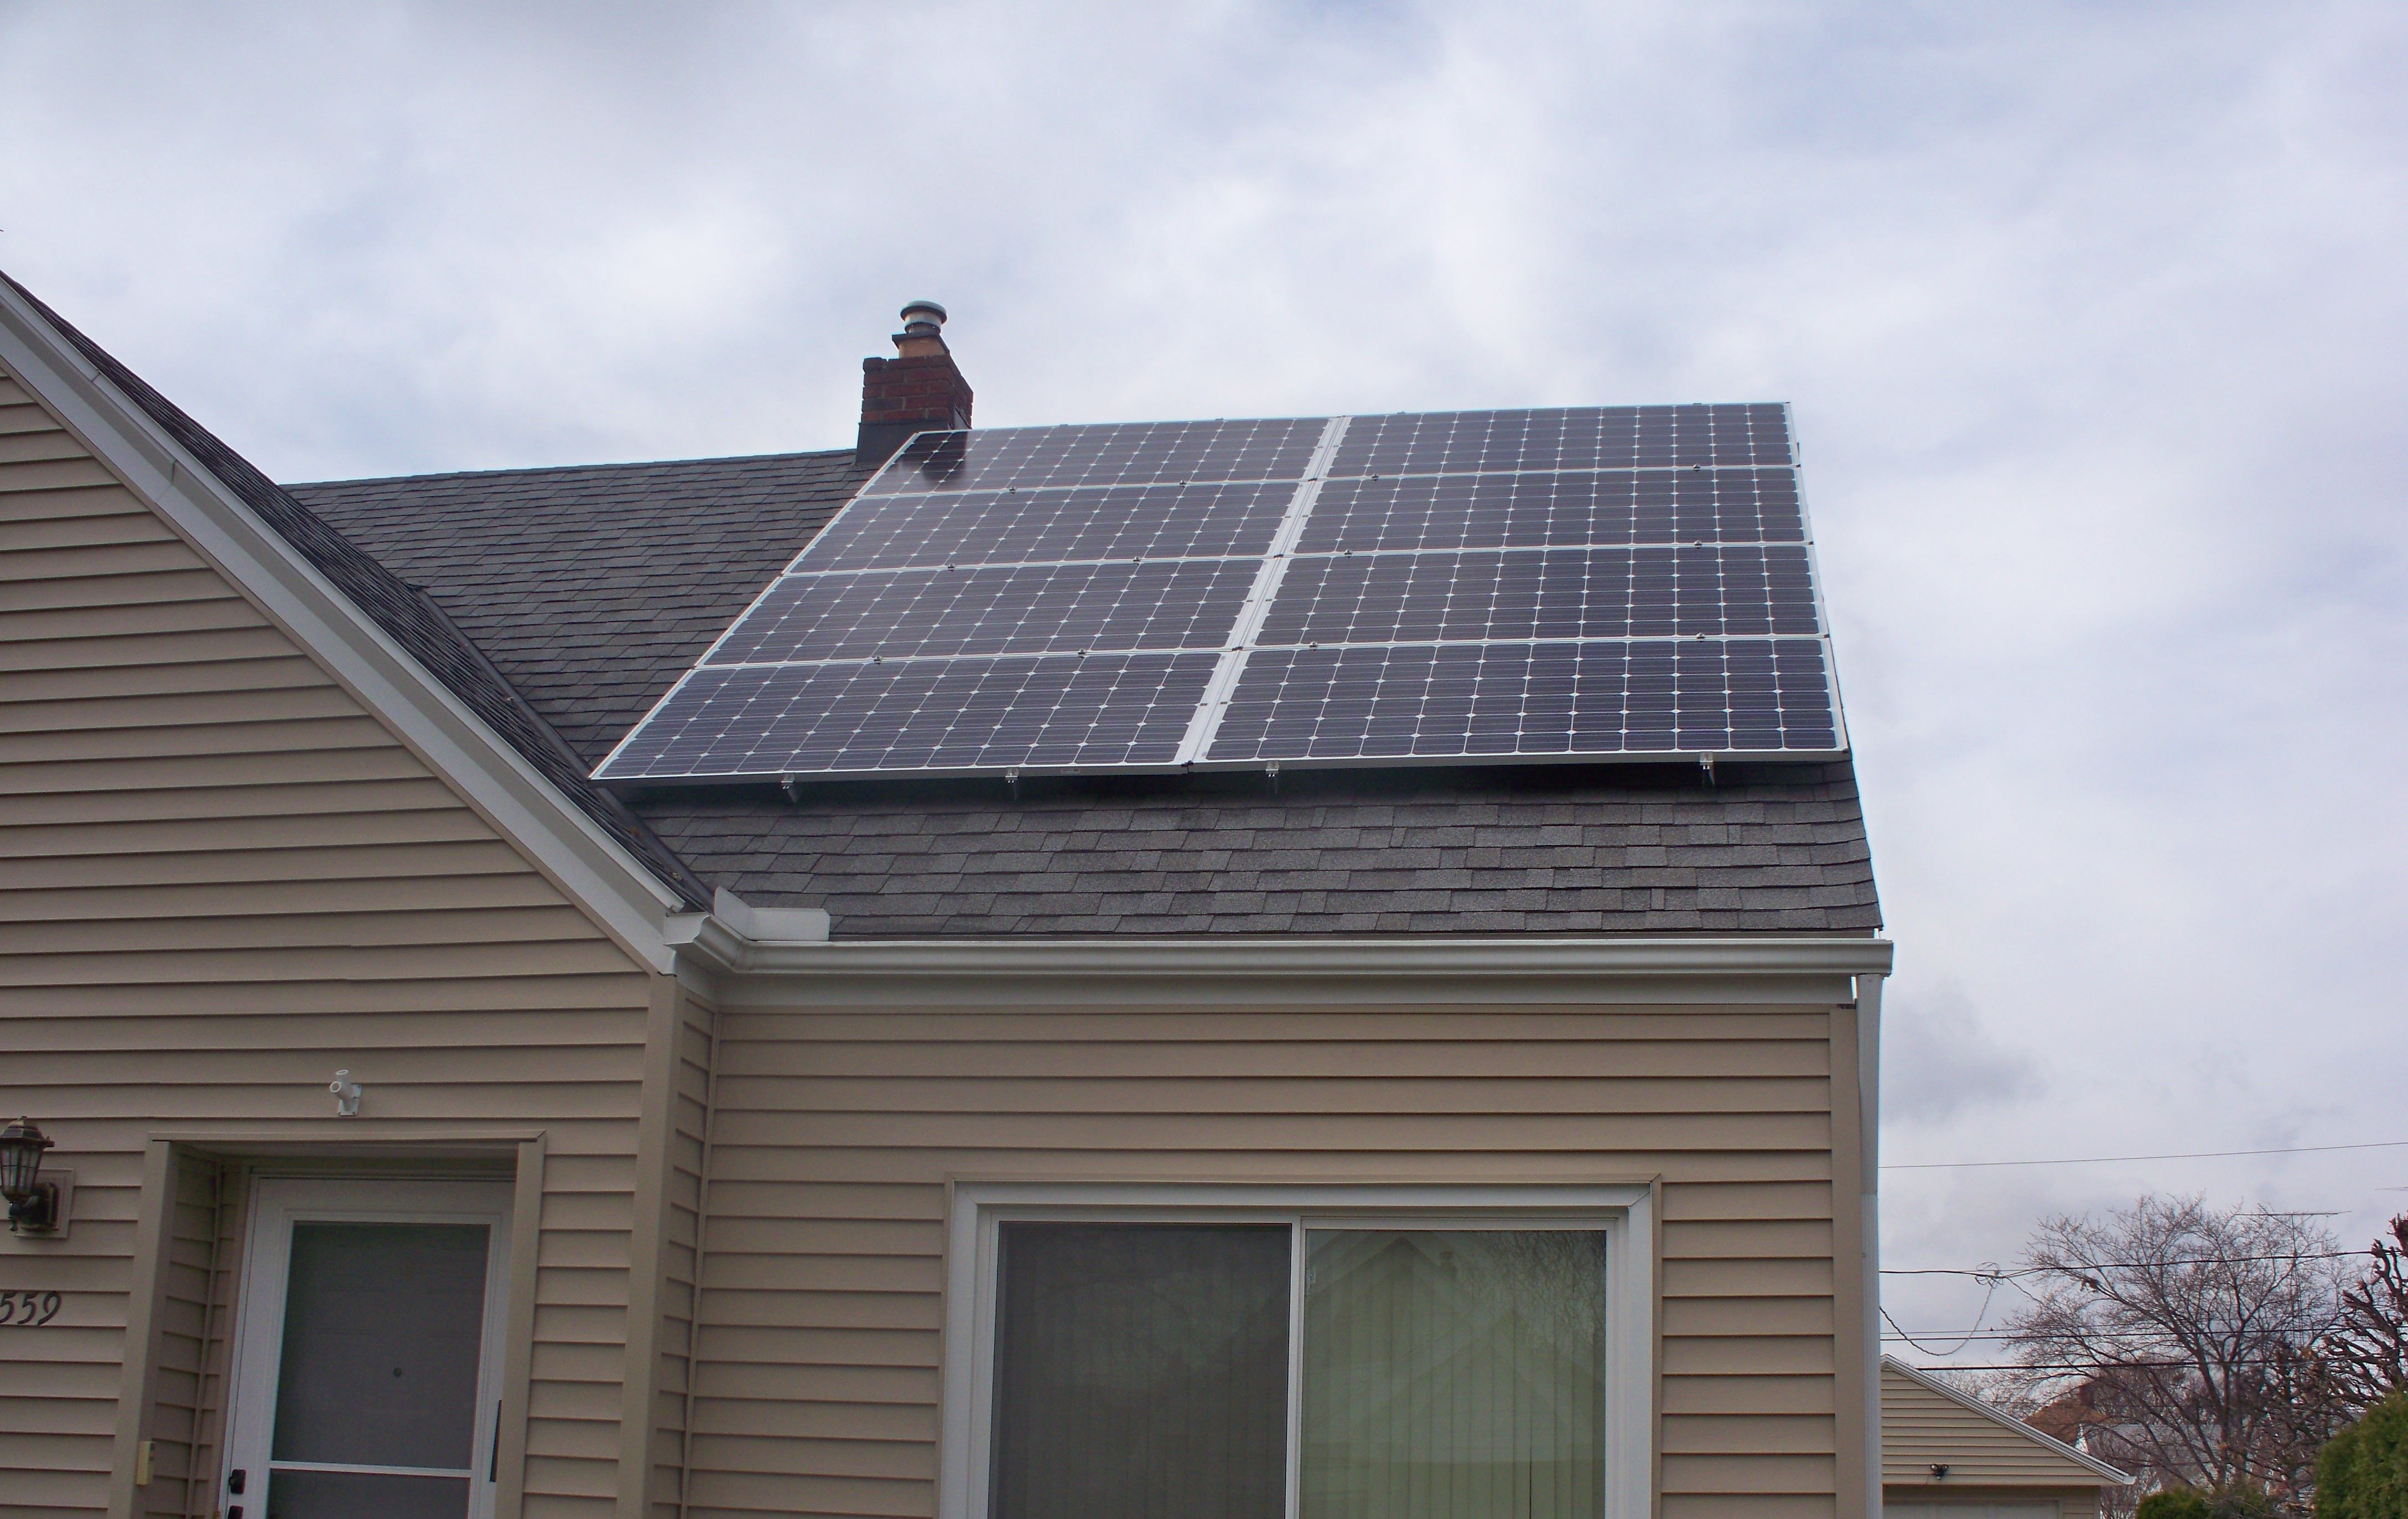 October 9 2015 Installation Of Residential 5 1 Kw Solar System In Toledo Oh Solar Panel Installation Roof Solar Panel Solar Panels